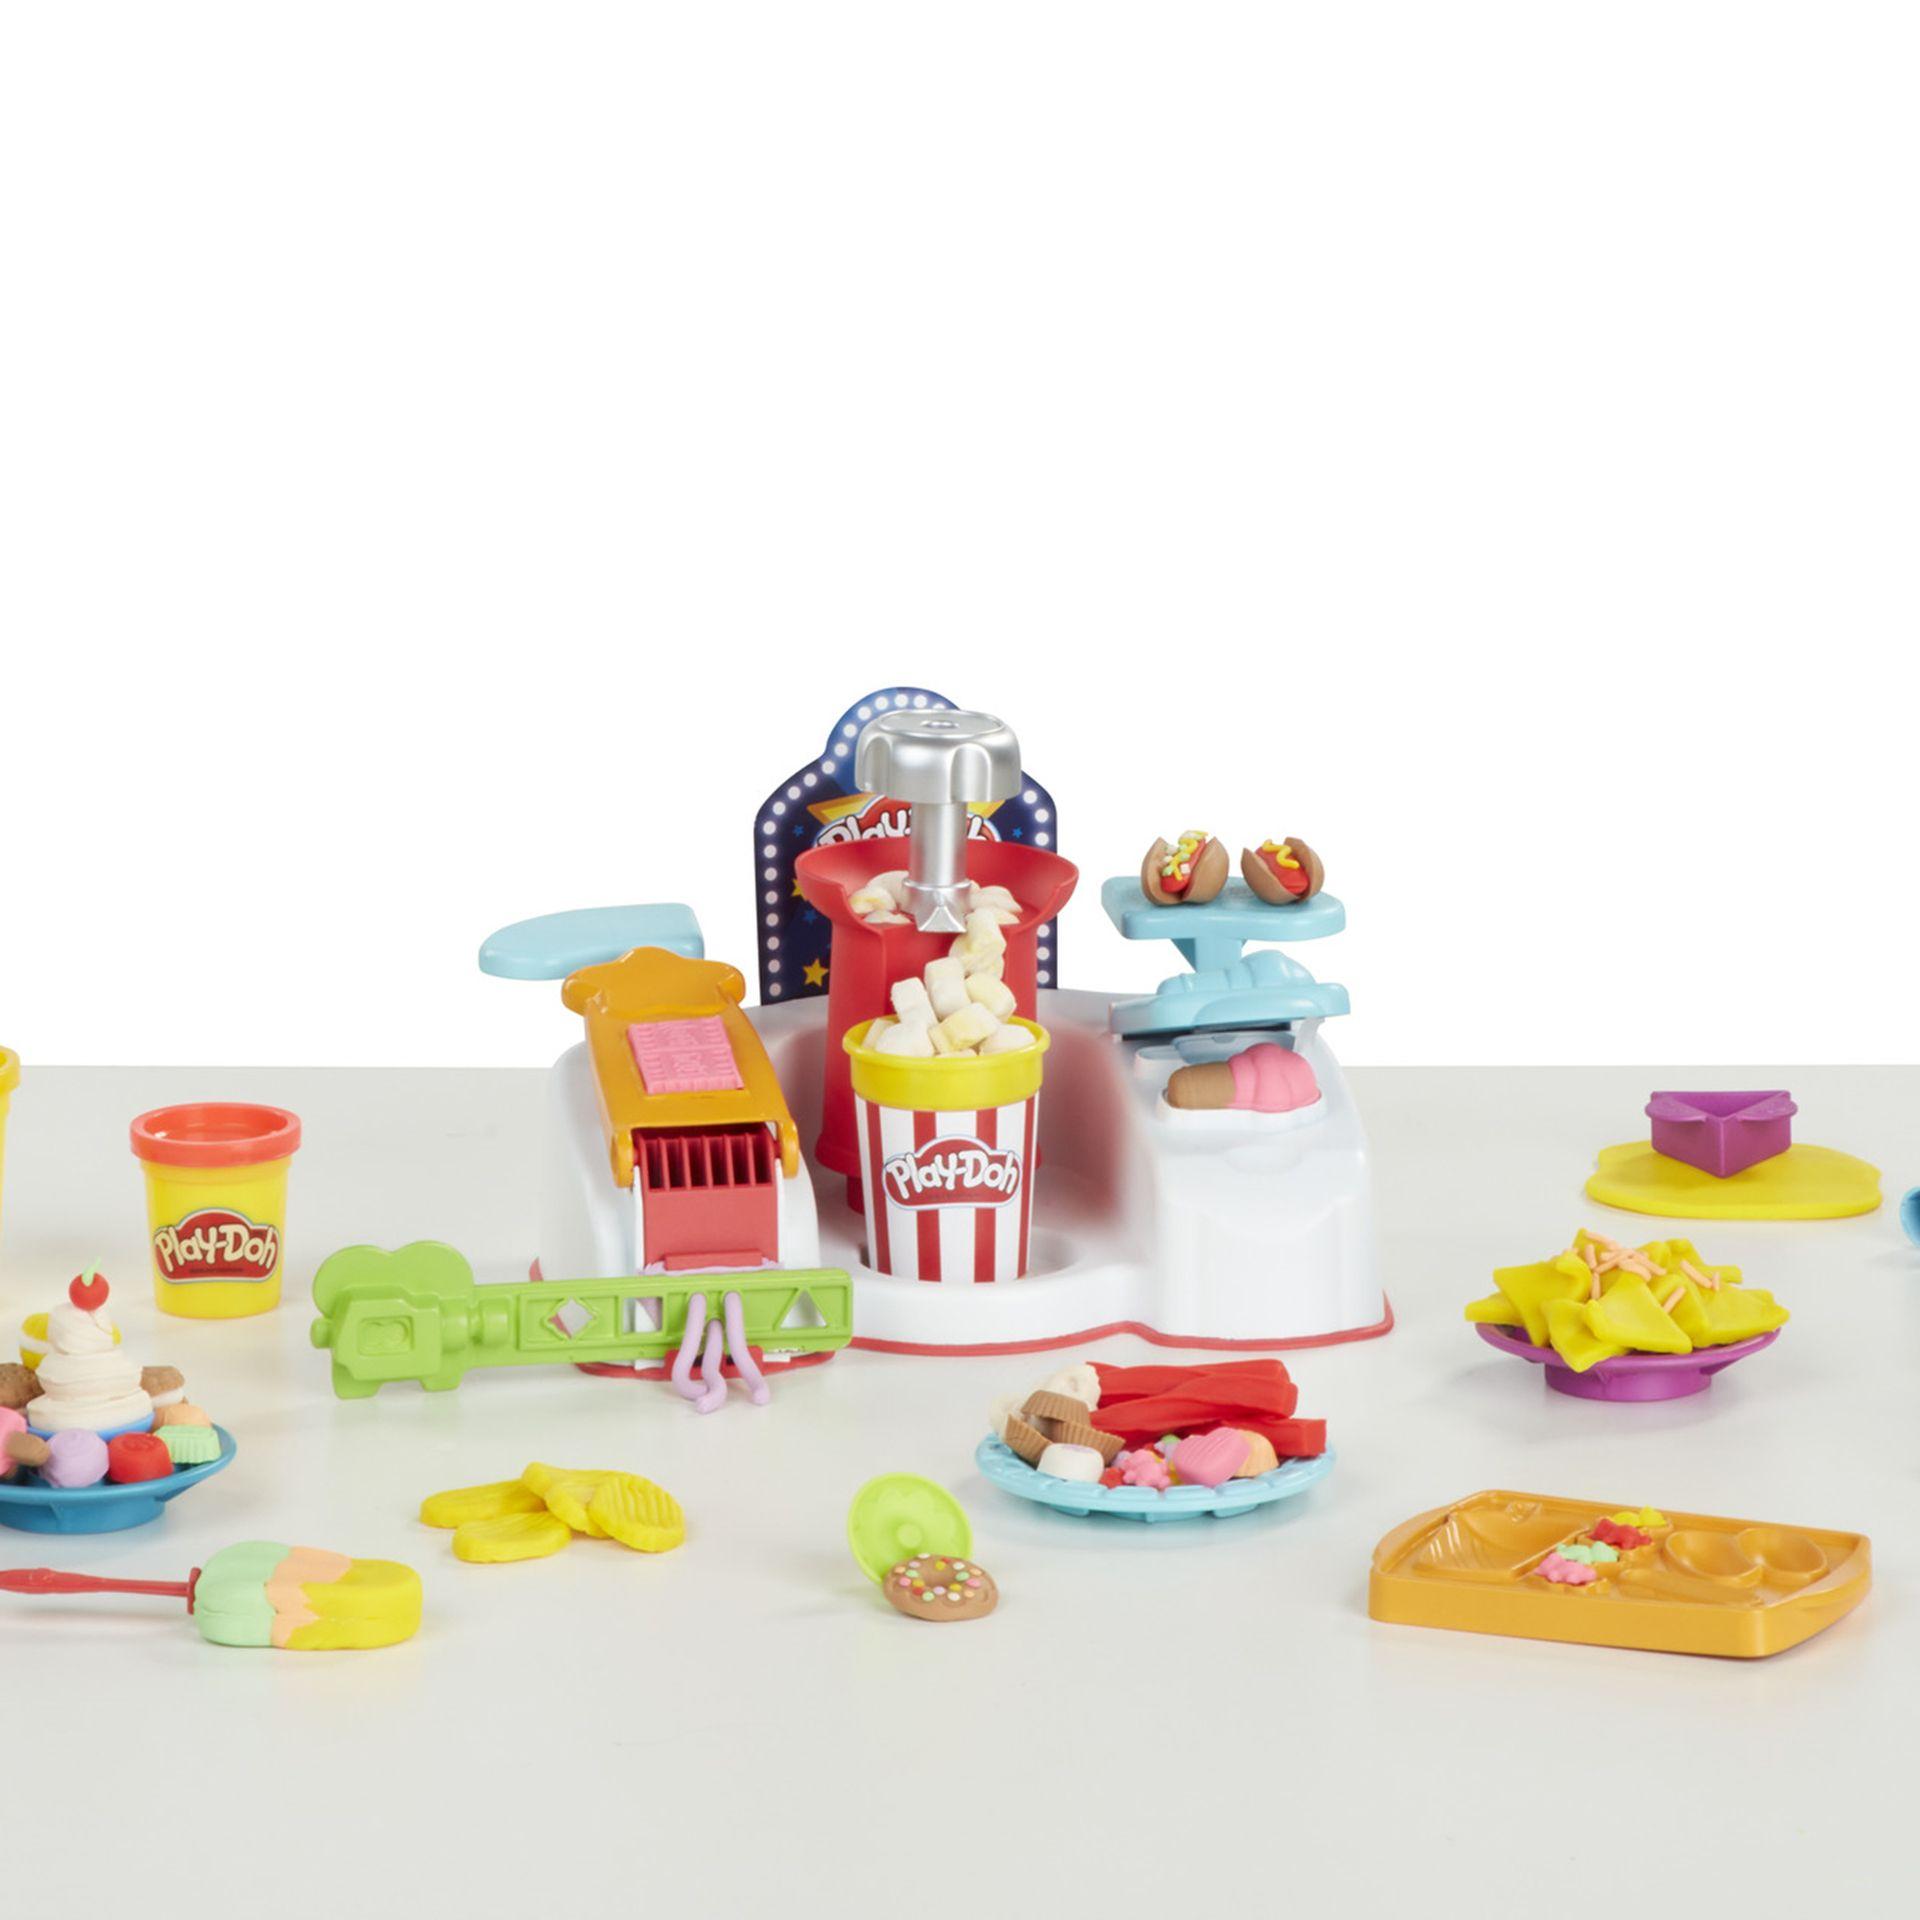 Play Doh Kitchen Creations Movie Snacks Set Target Play Doh Kitchen Creation Movie Movie Snacks